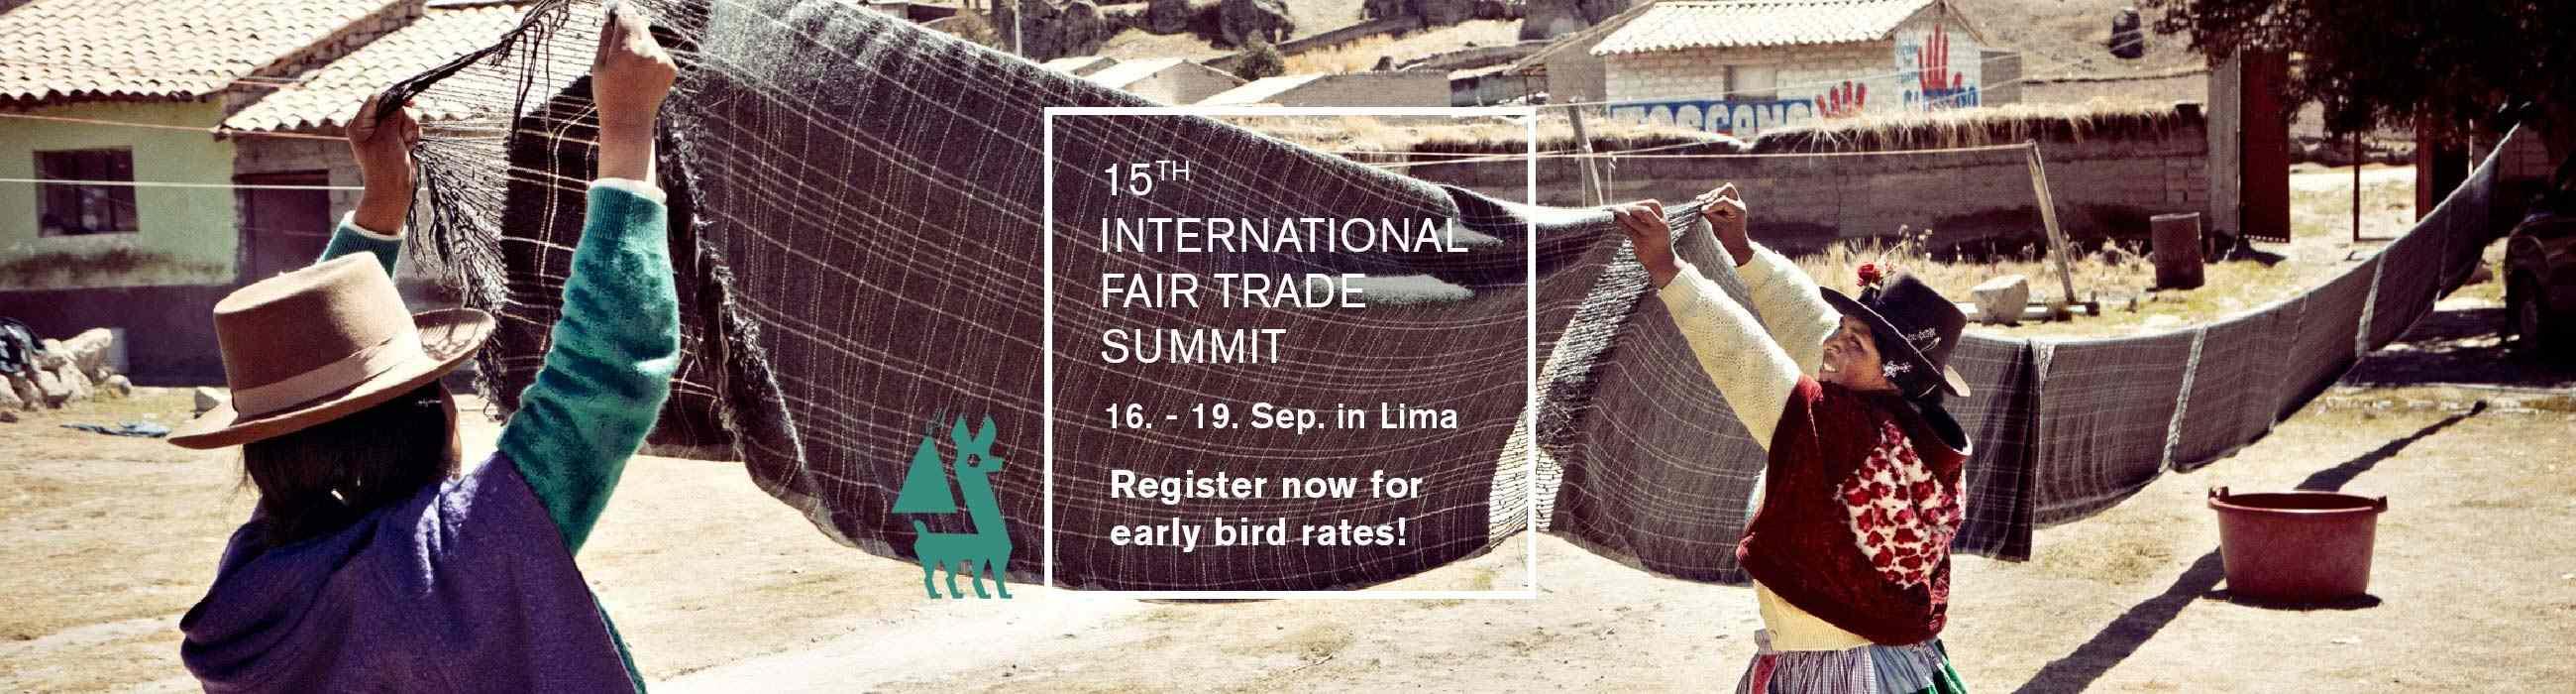 International Fair Trade Summit - Lima, Peru